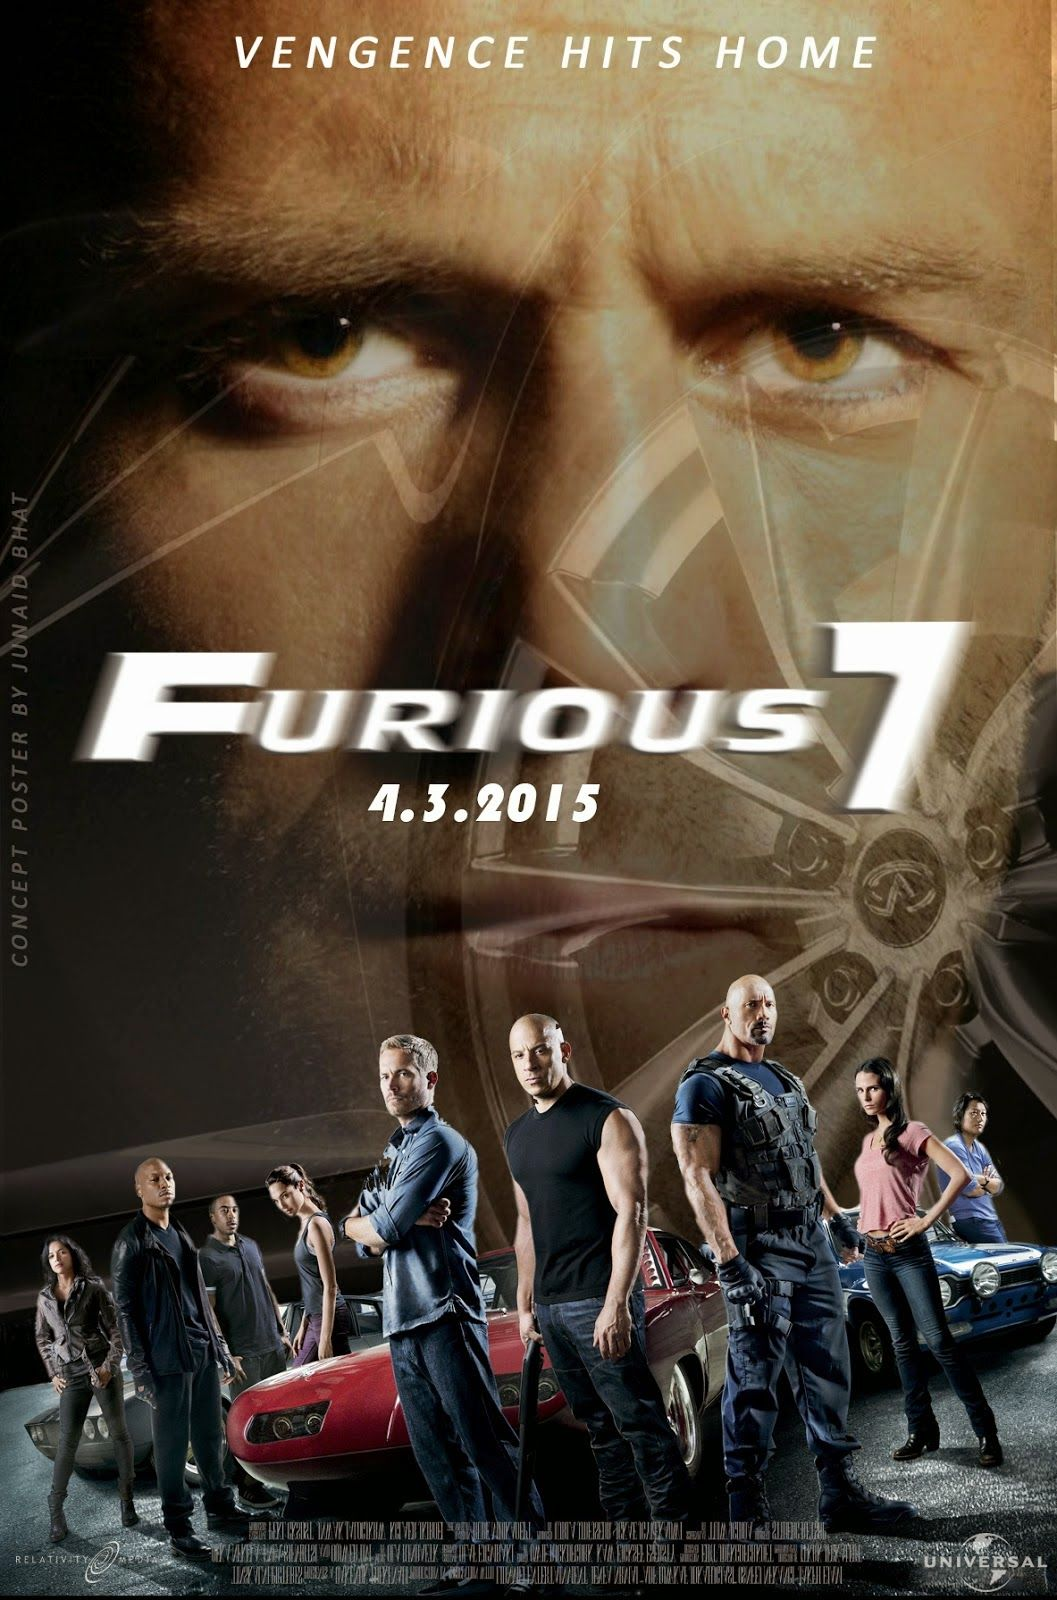 Nonton Fast And Furious 7 (2015) Subtitle Indonesia Terbaru